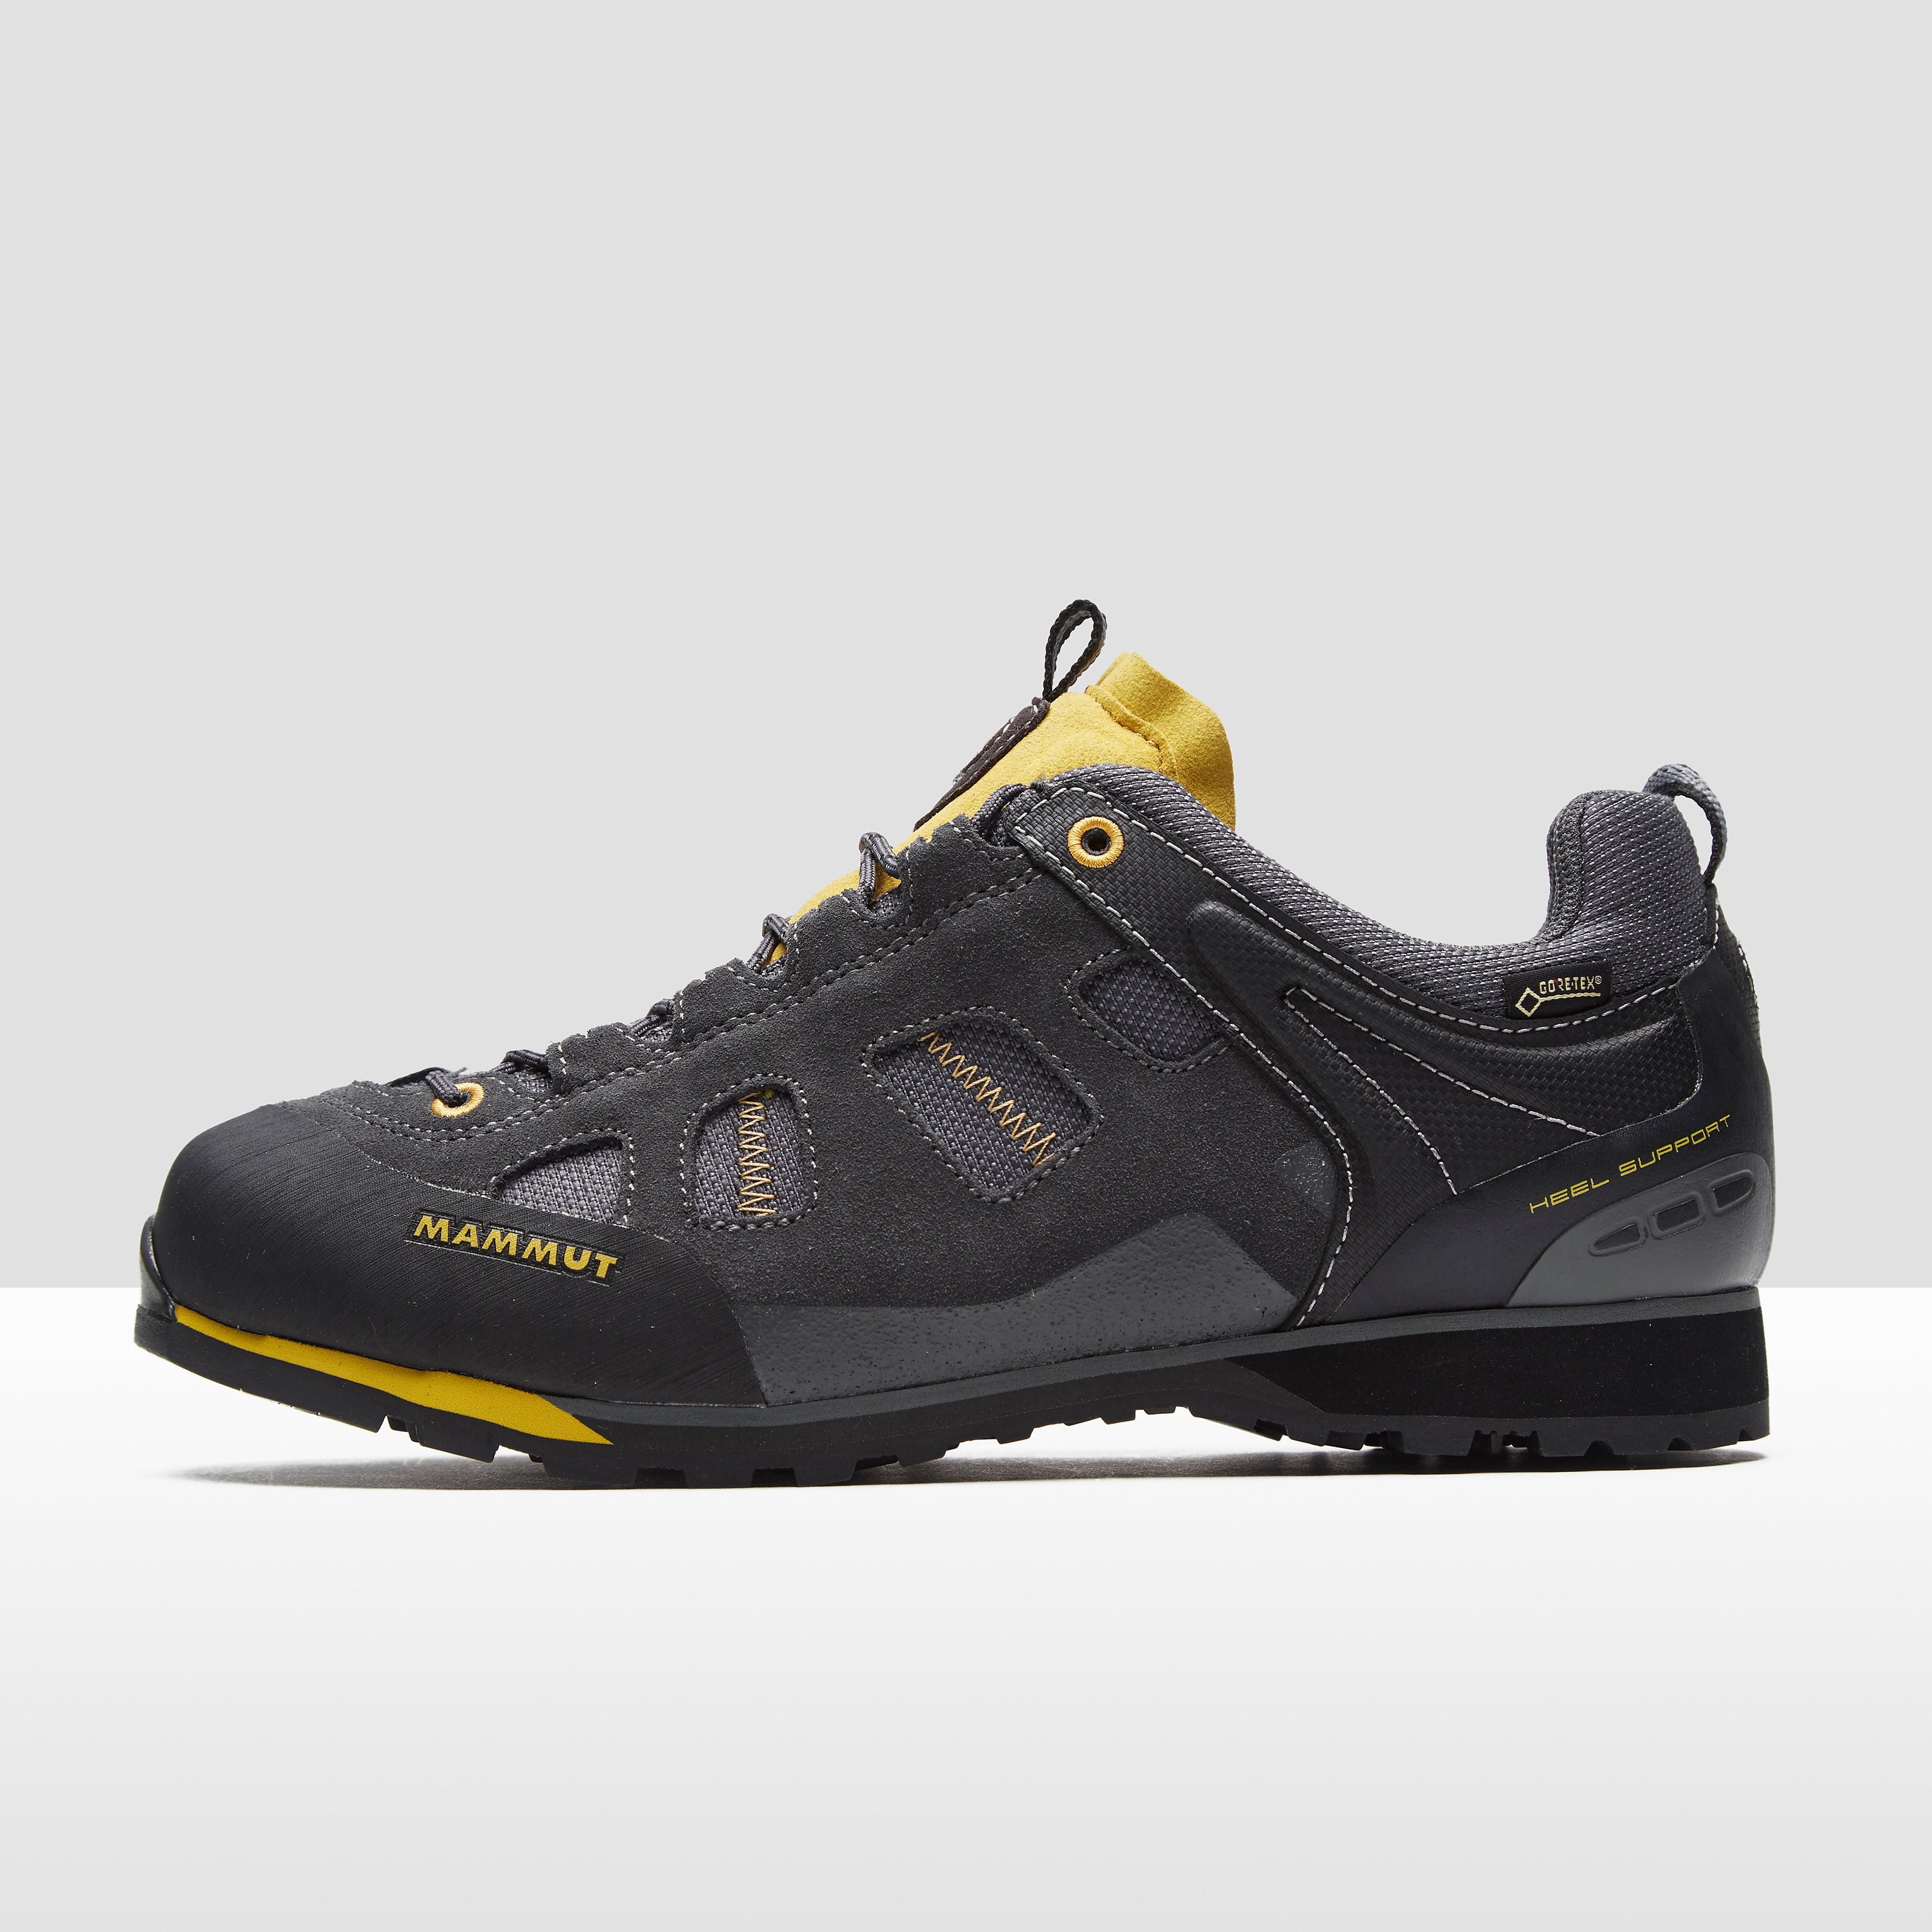 Mammut Ayako Low GTX Men's Shoes